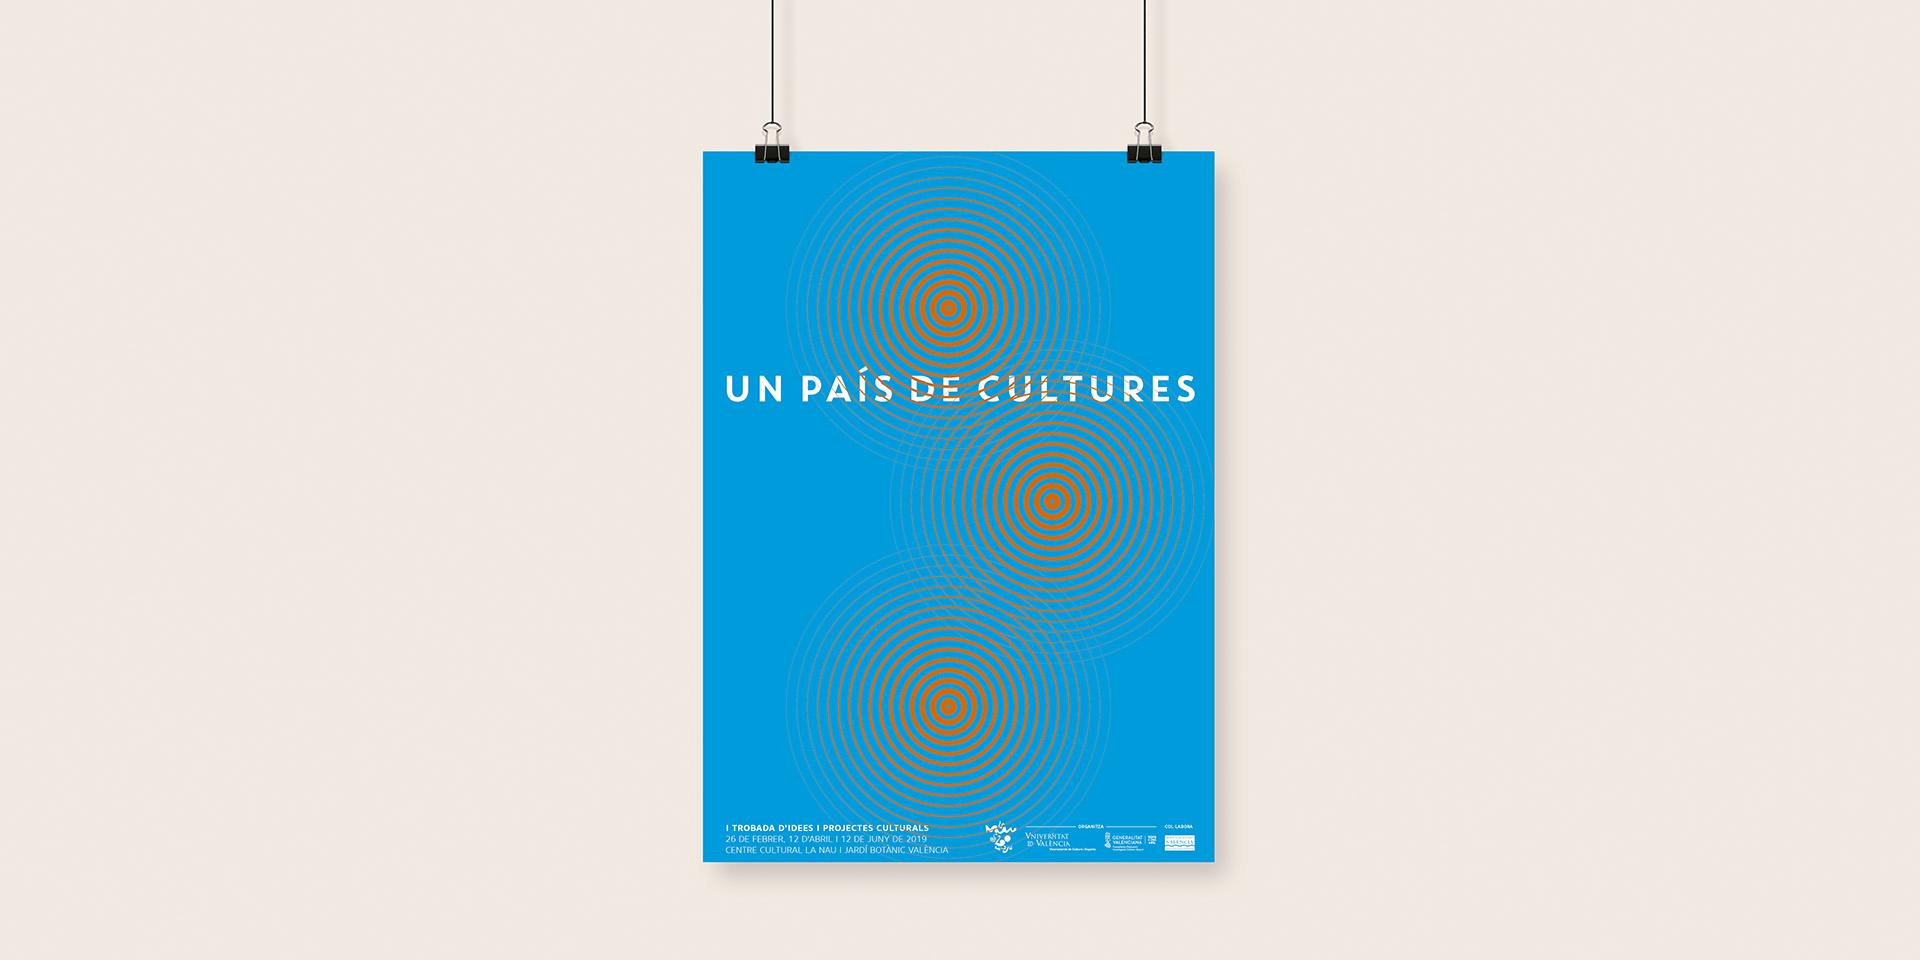 Un País de Cultures